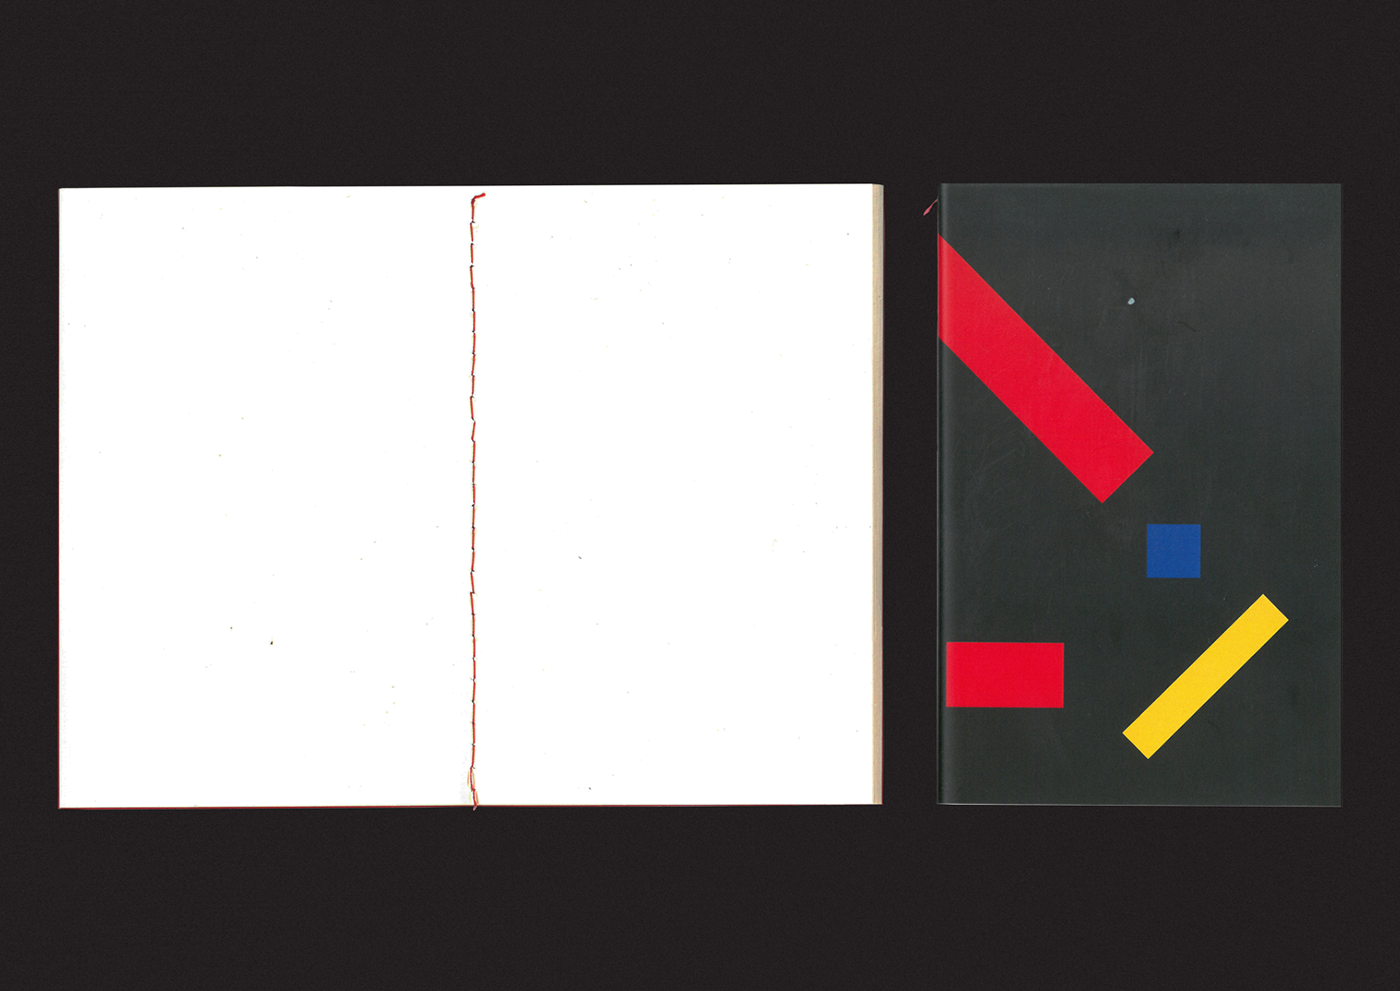 bauhaus dessau Gerrit Rietveld weimar